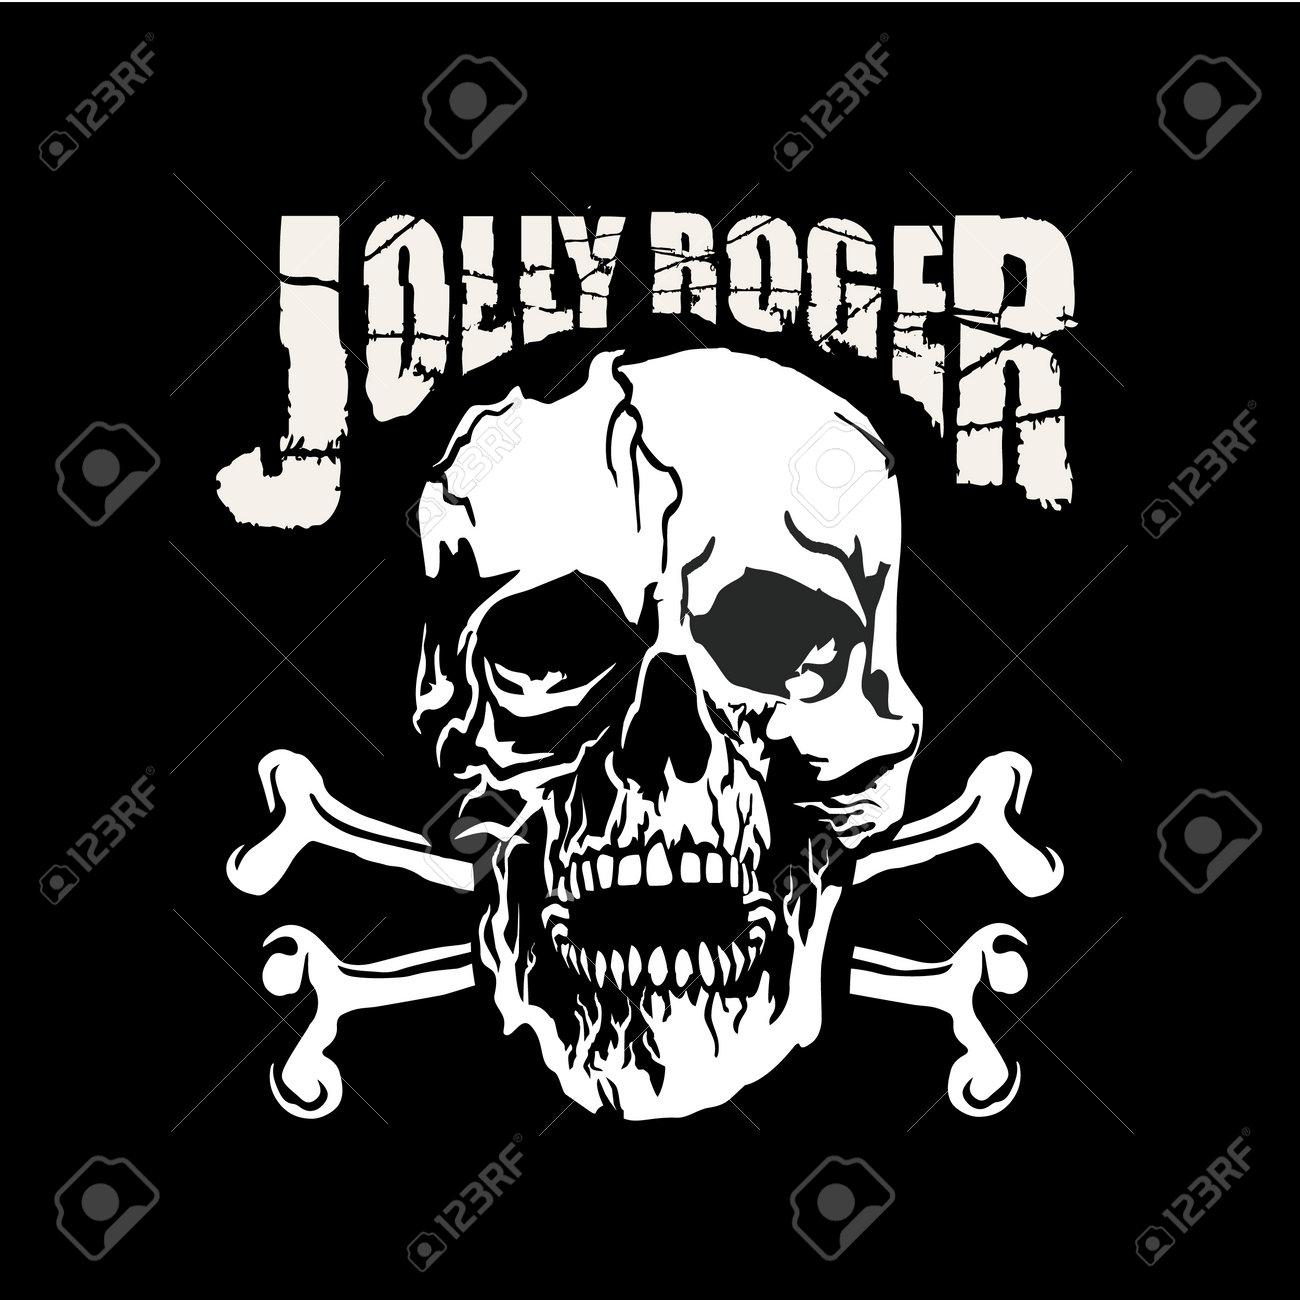 Gothic sign with skull, grunge vintage design t shirts - 168635143